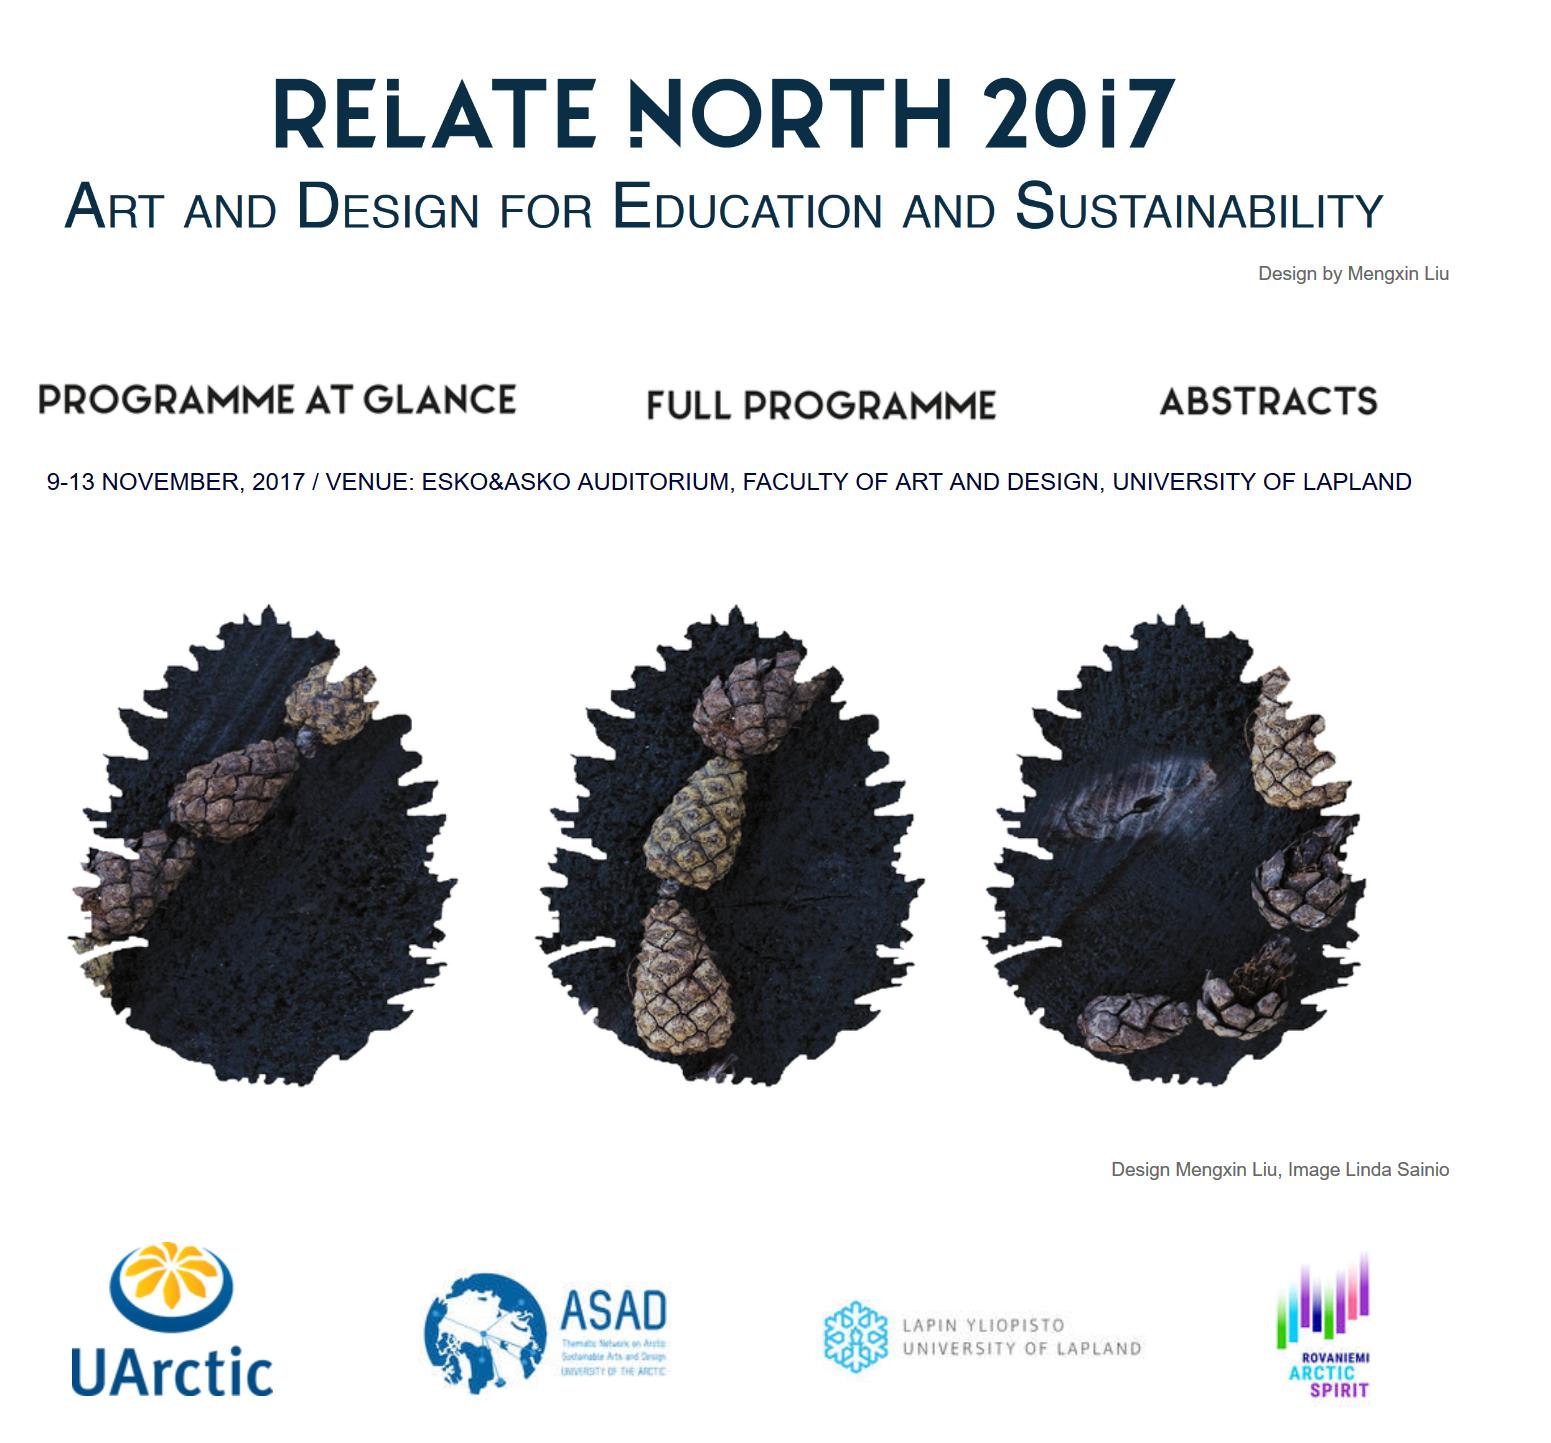 Screenshot-2017-11-12 RELATE NORTH 2017